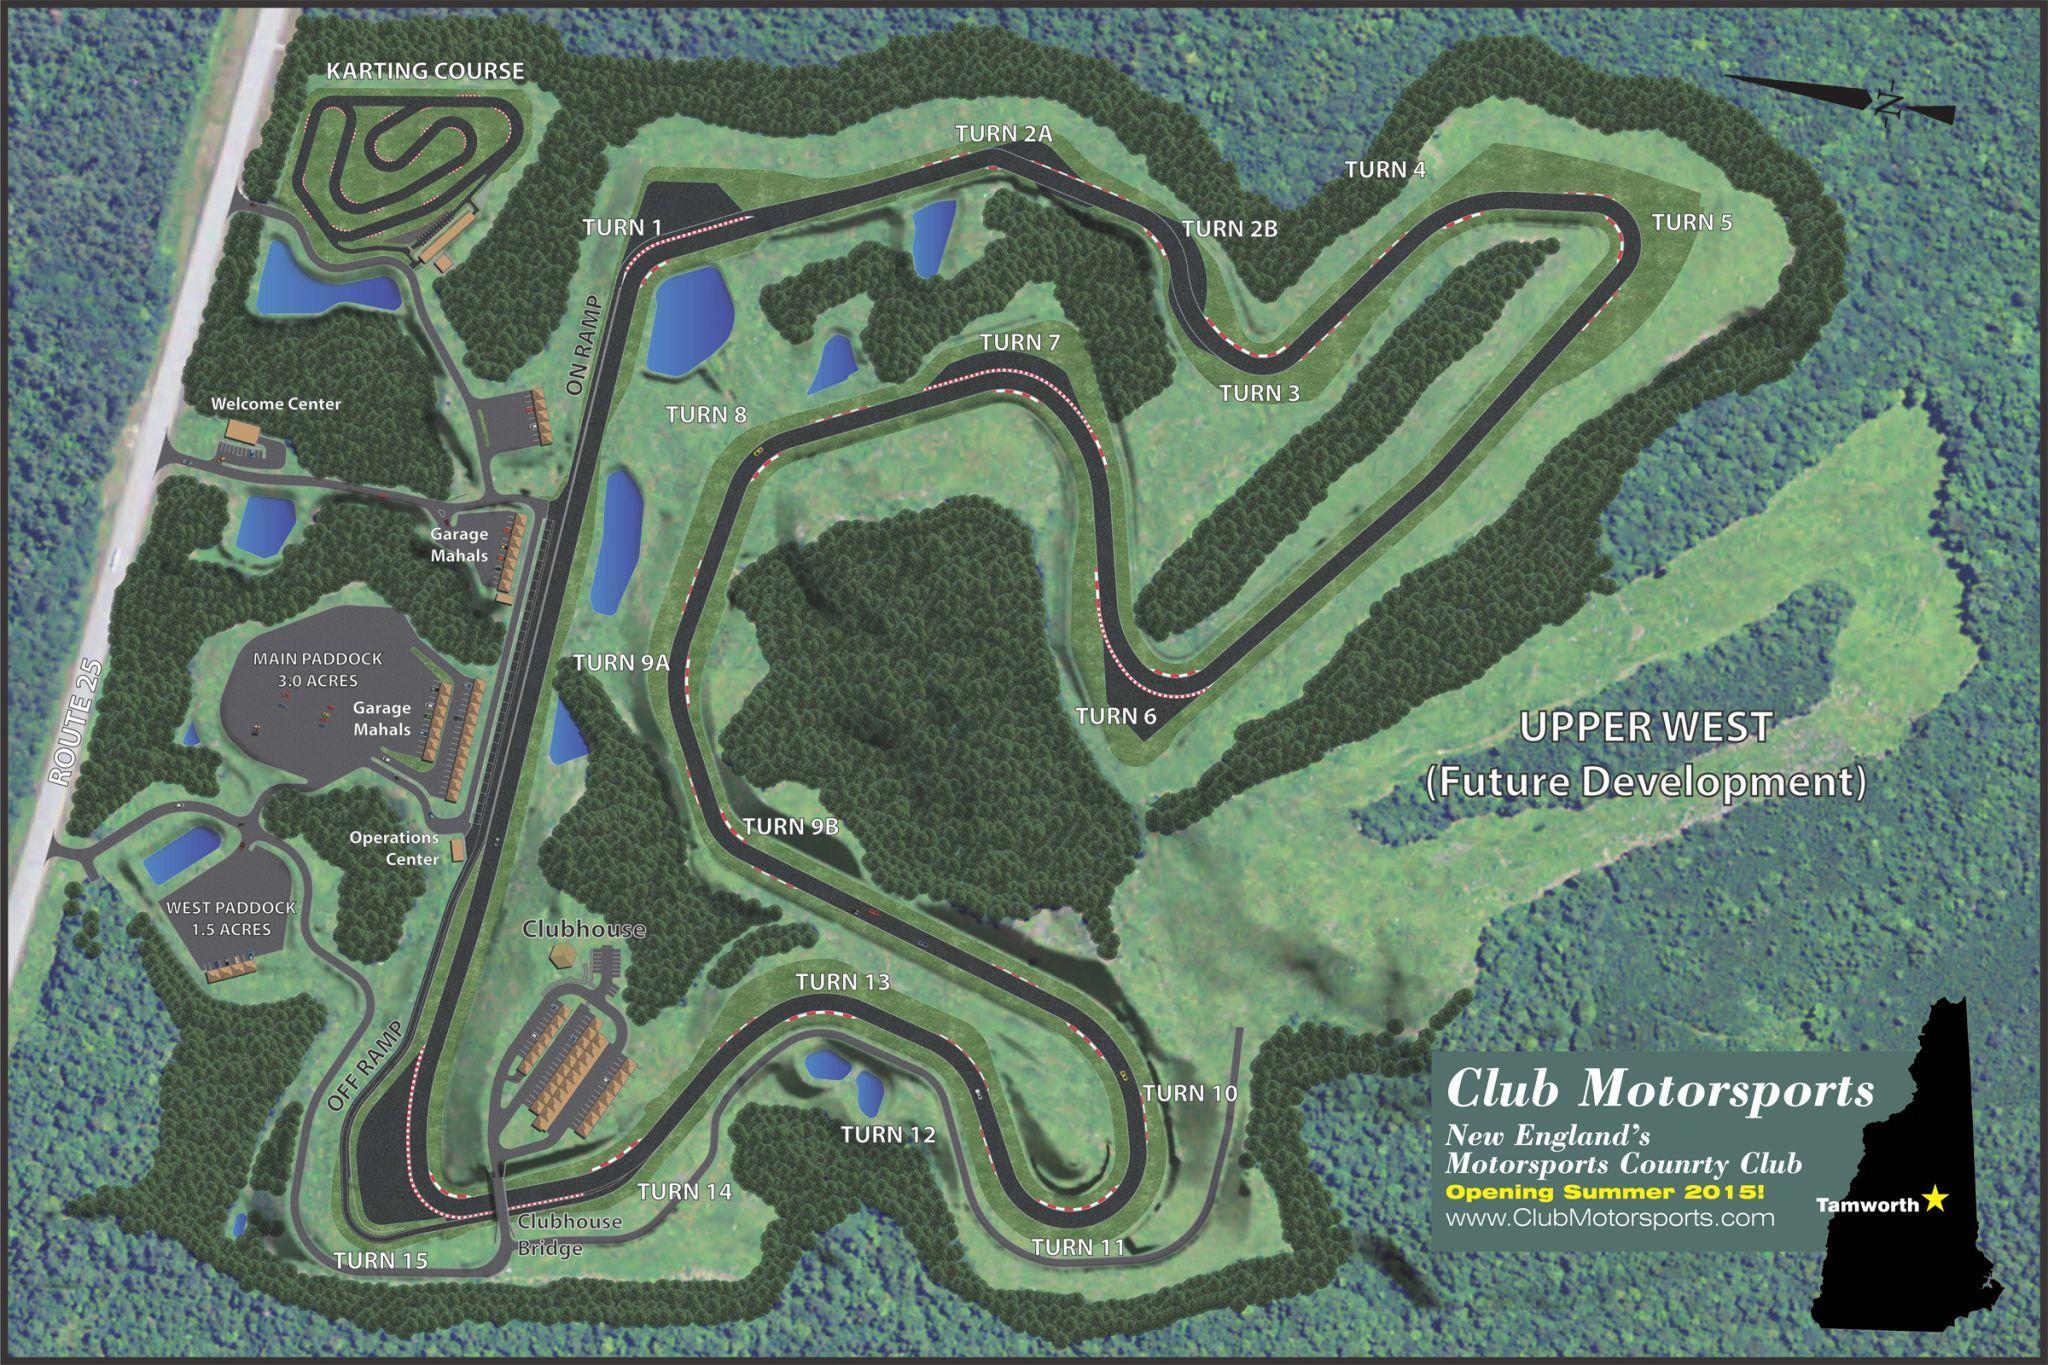 Club Motorsports Layout Explained Motorsport Race Track Slot Racing